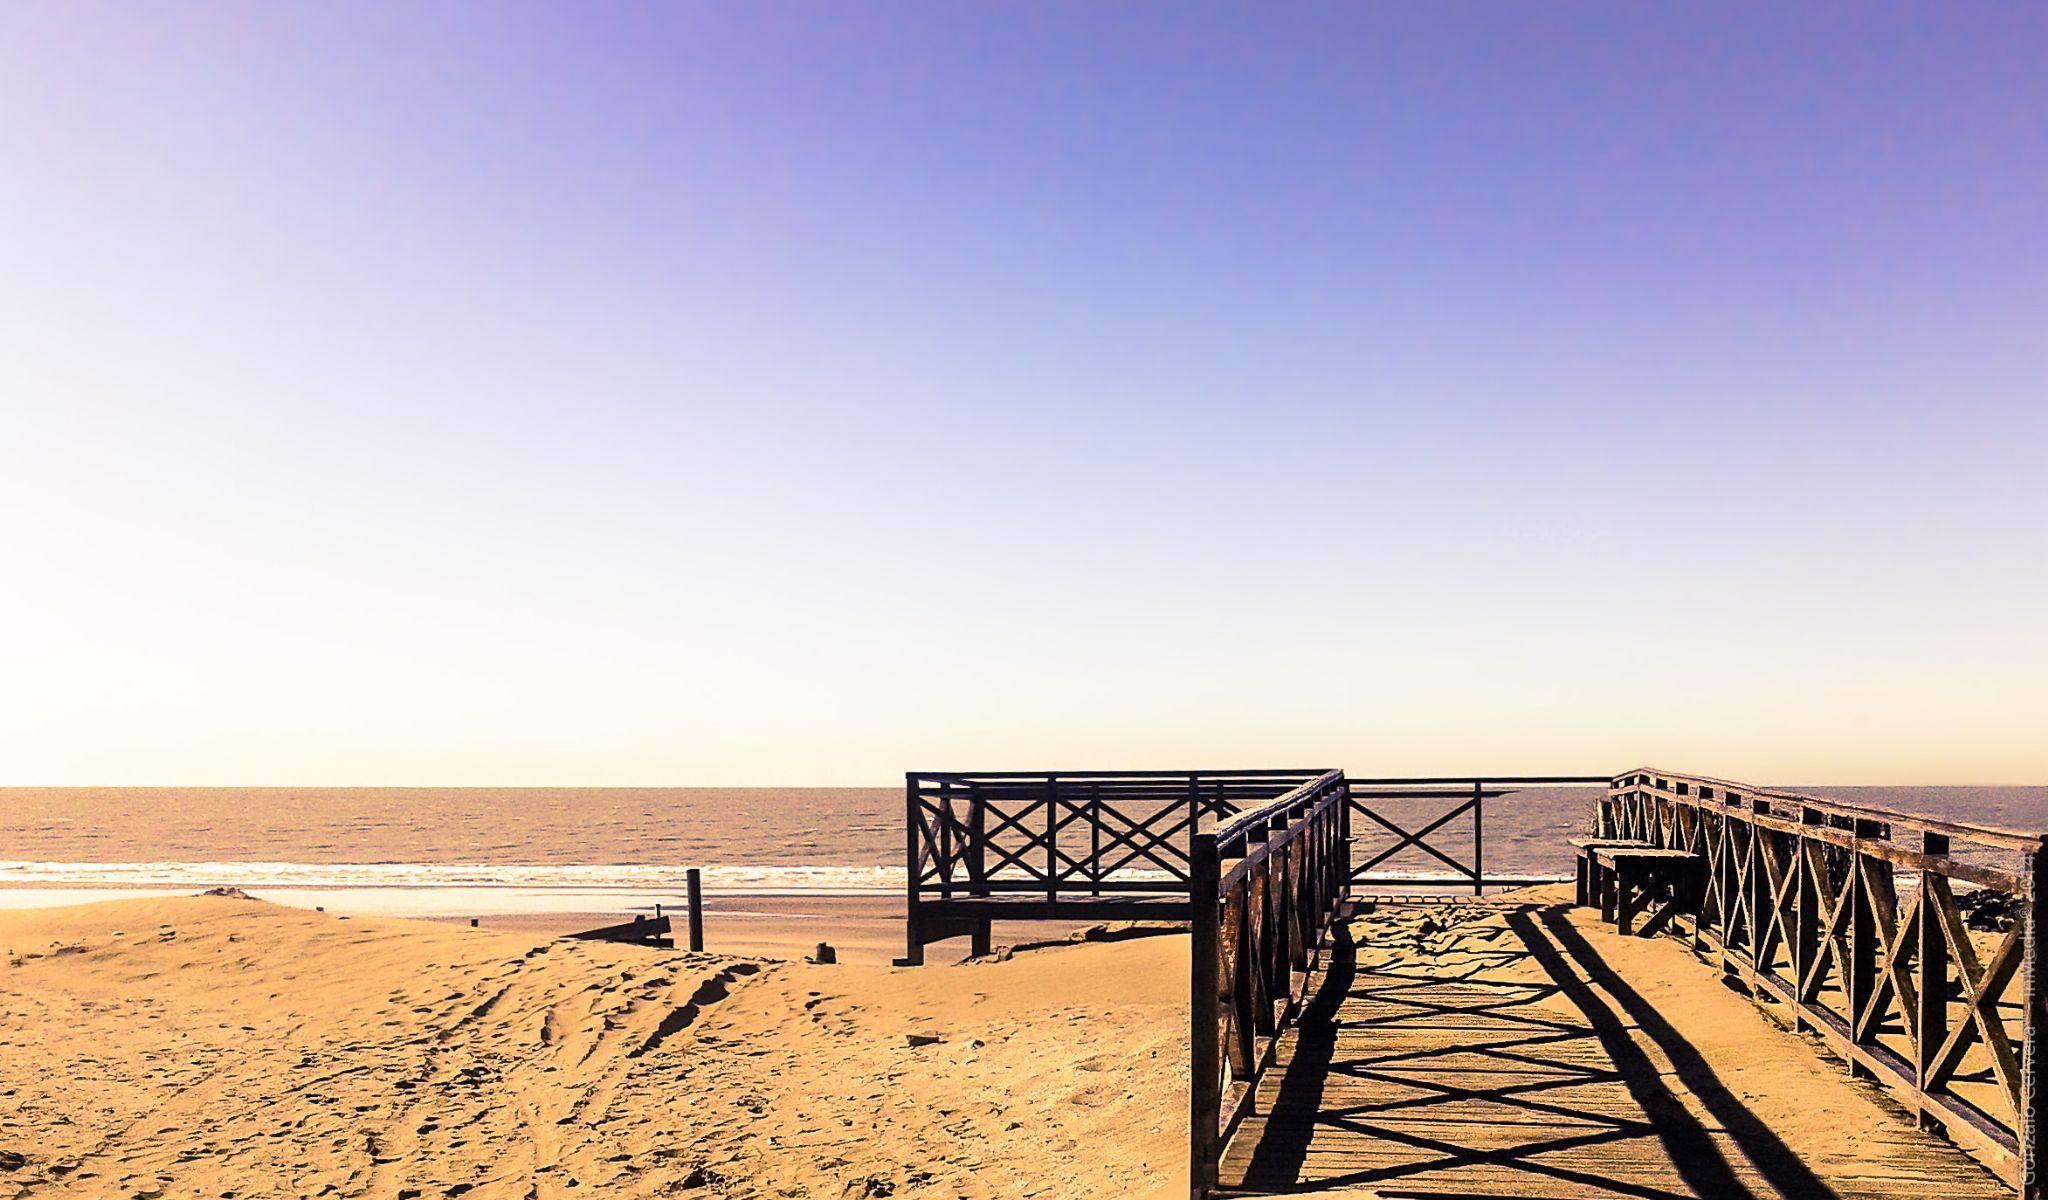 beach one day by Gonzalo Cervera